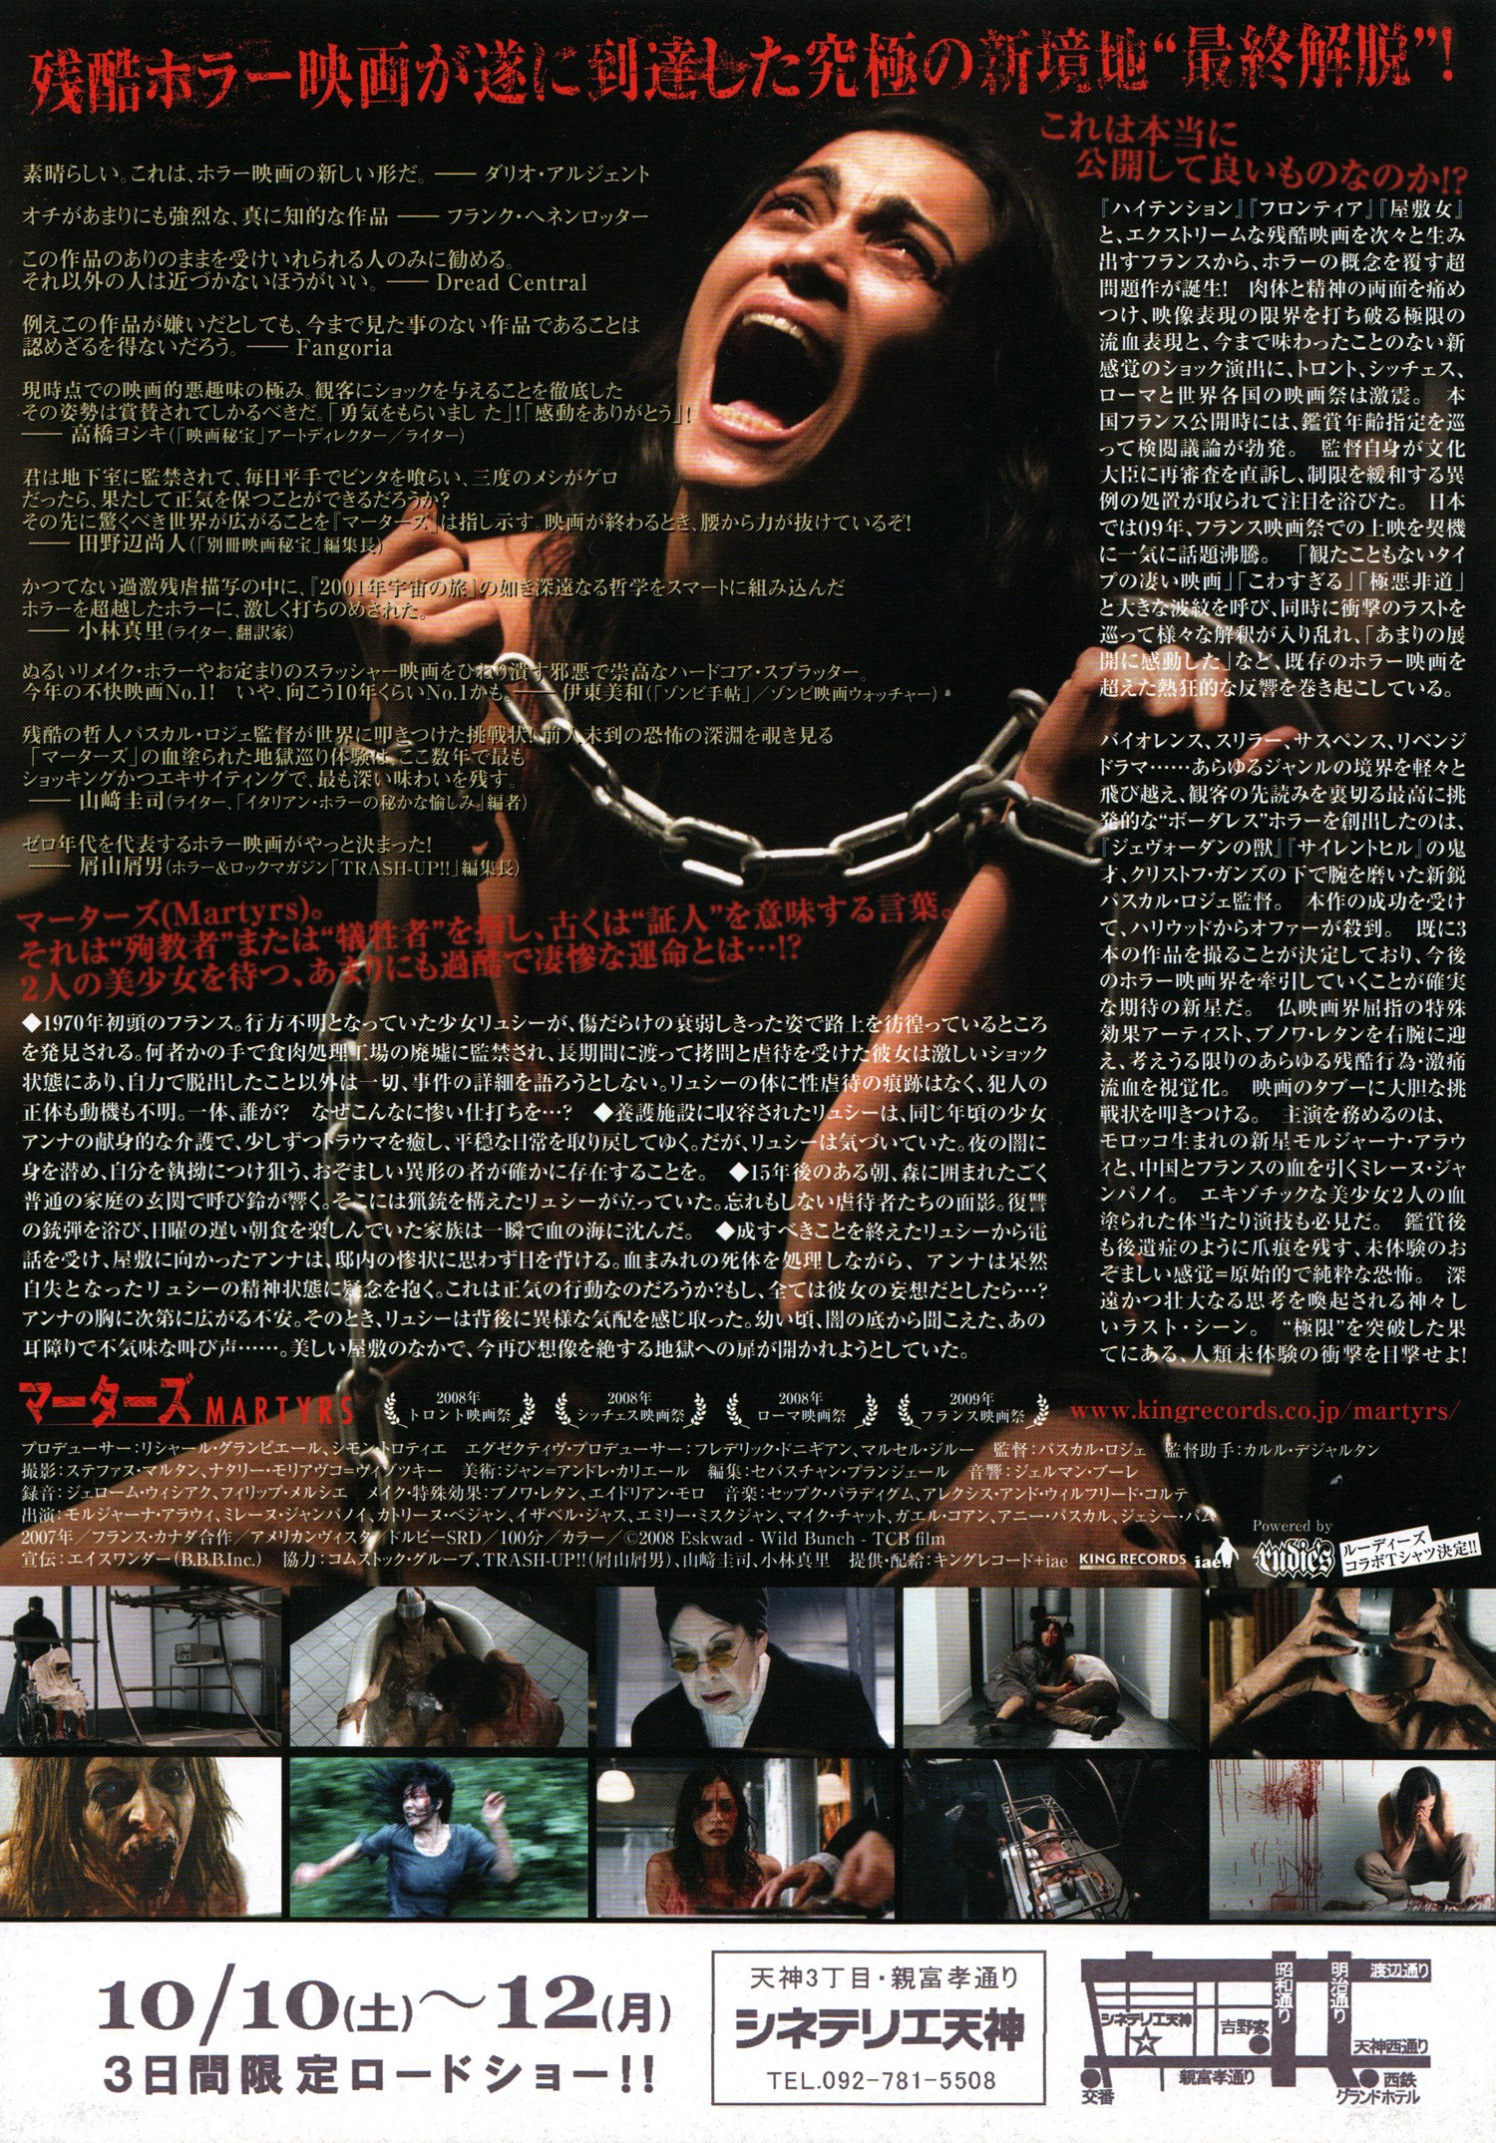 martyrs-japan-2